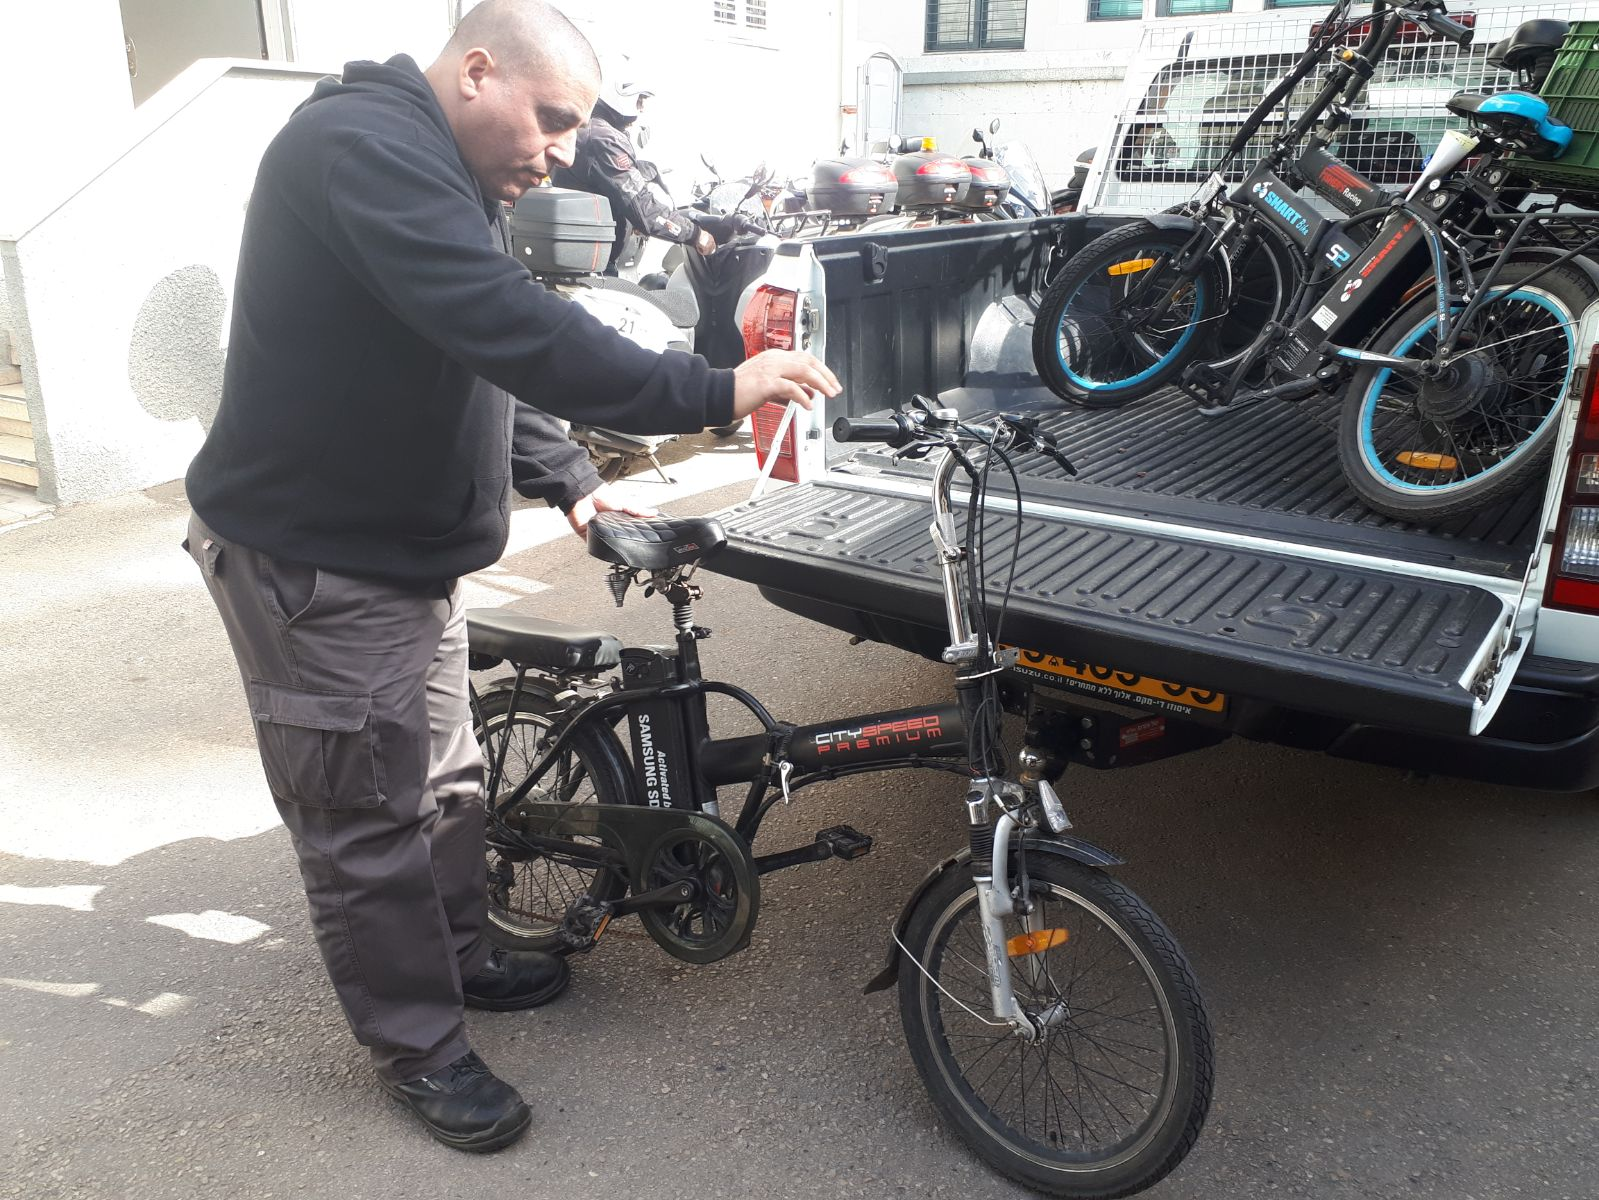 Photo of שבוע חדש, דוחות חדשים. 510 דוחות תנועה נרשמו השבוע, מתוכם 131 נגד רוכבי אופניים חשמליים